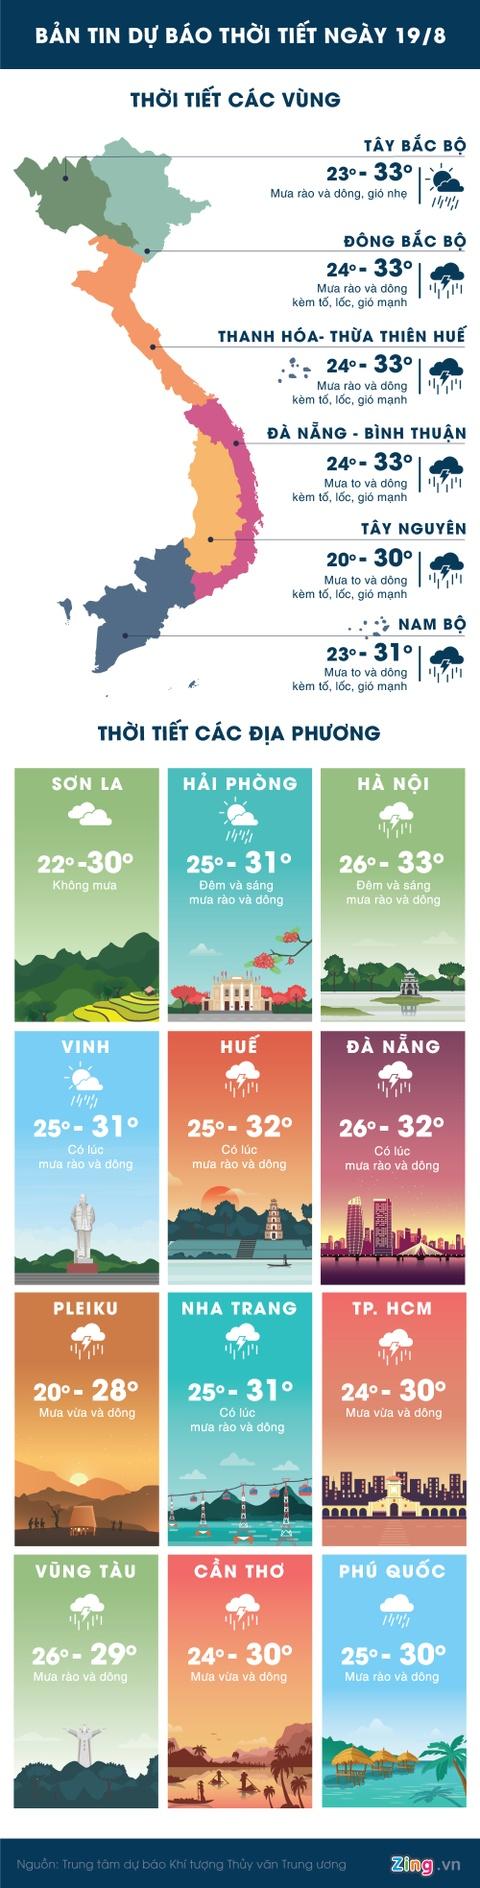 Sai Gon mua lon nguy co ngap, Ha Noi va Da Nang mua dong hinh anh 1